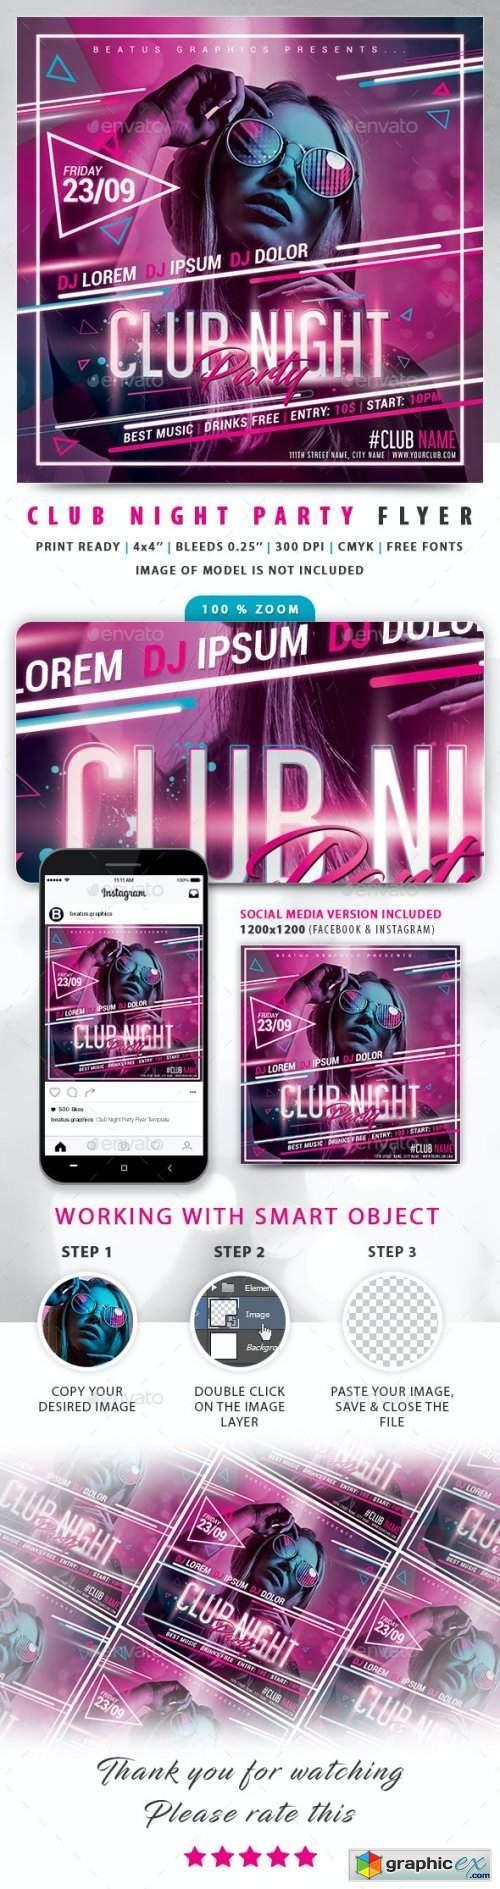 Club Night Party Flyer 24430389